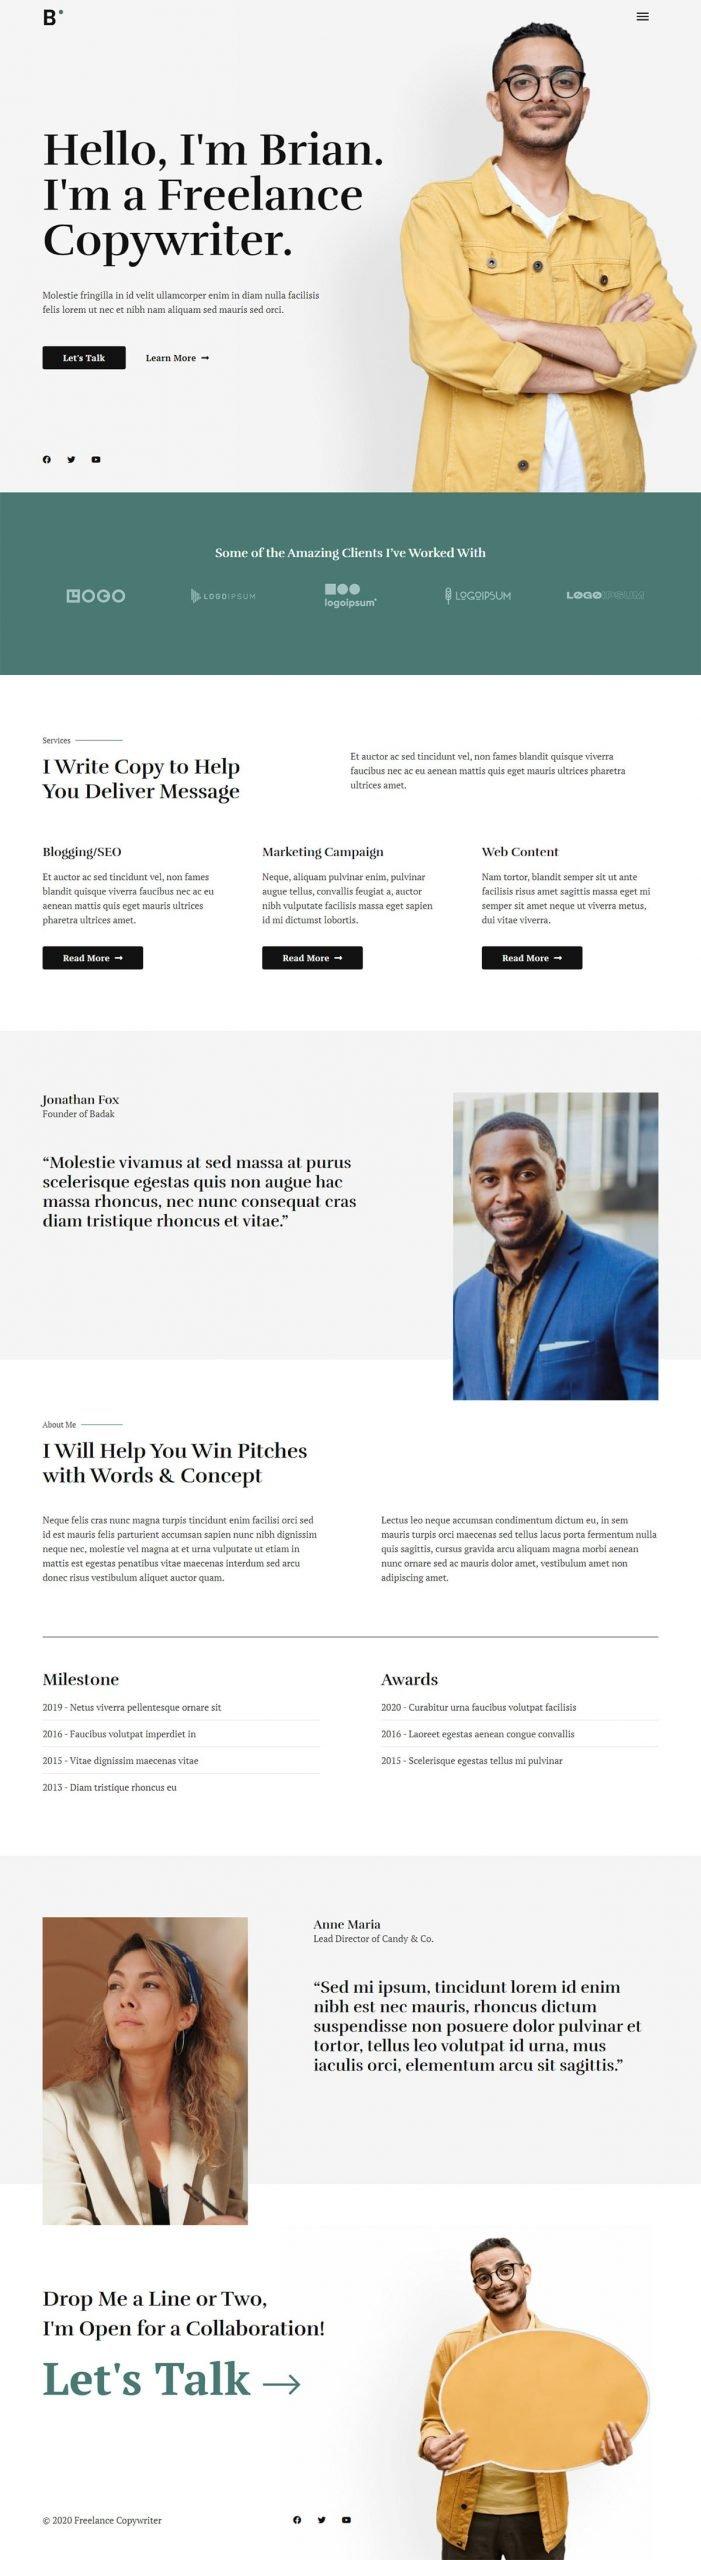 Adamo Web Design | Web Design Durham | freelance copywriter 02 homepage scaled